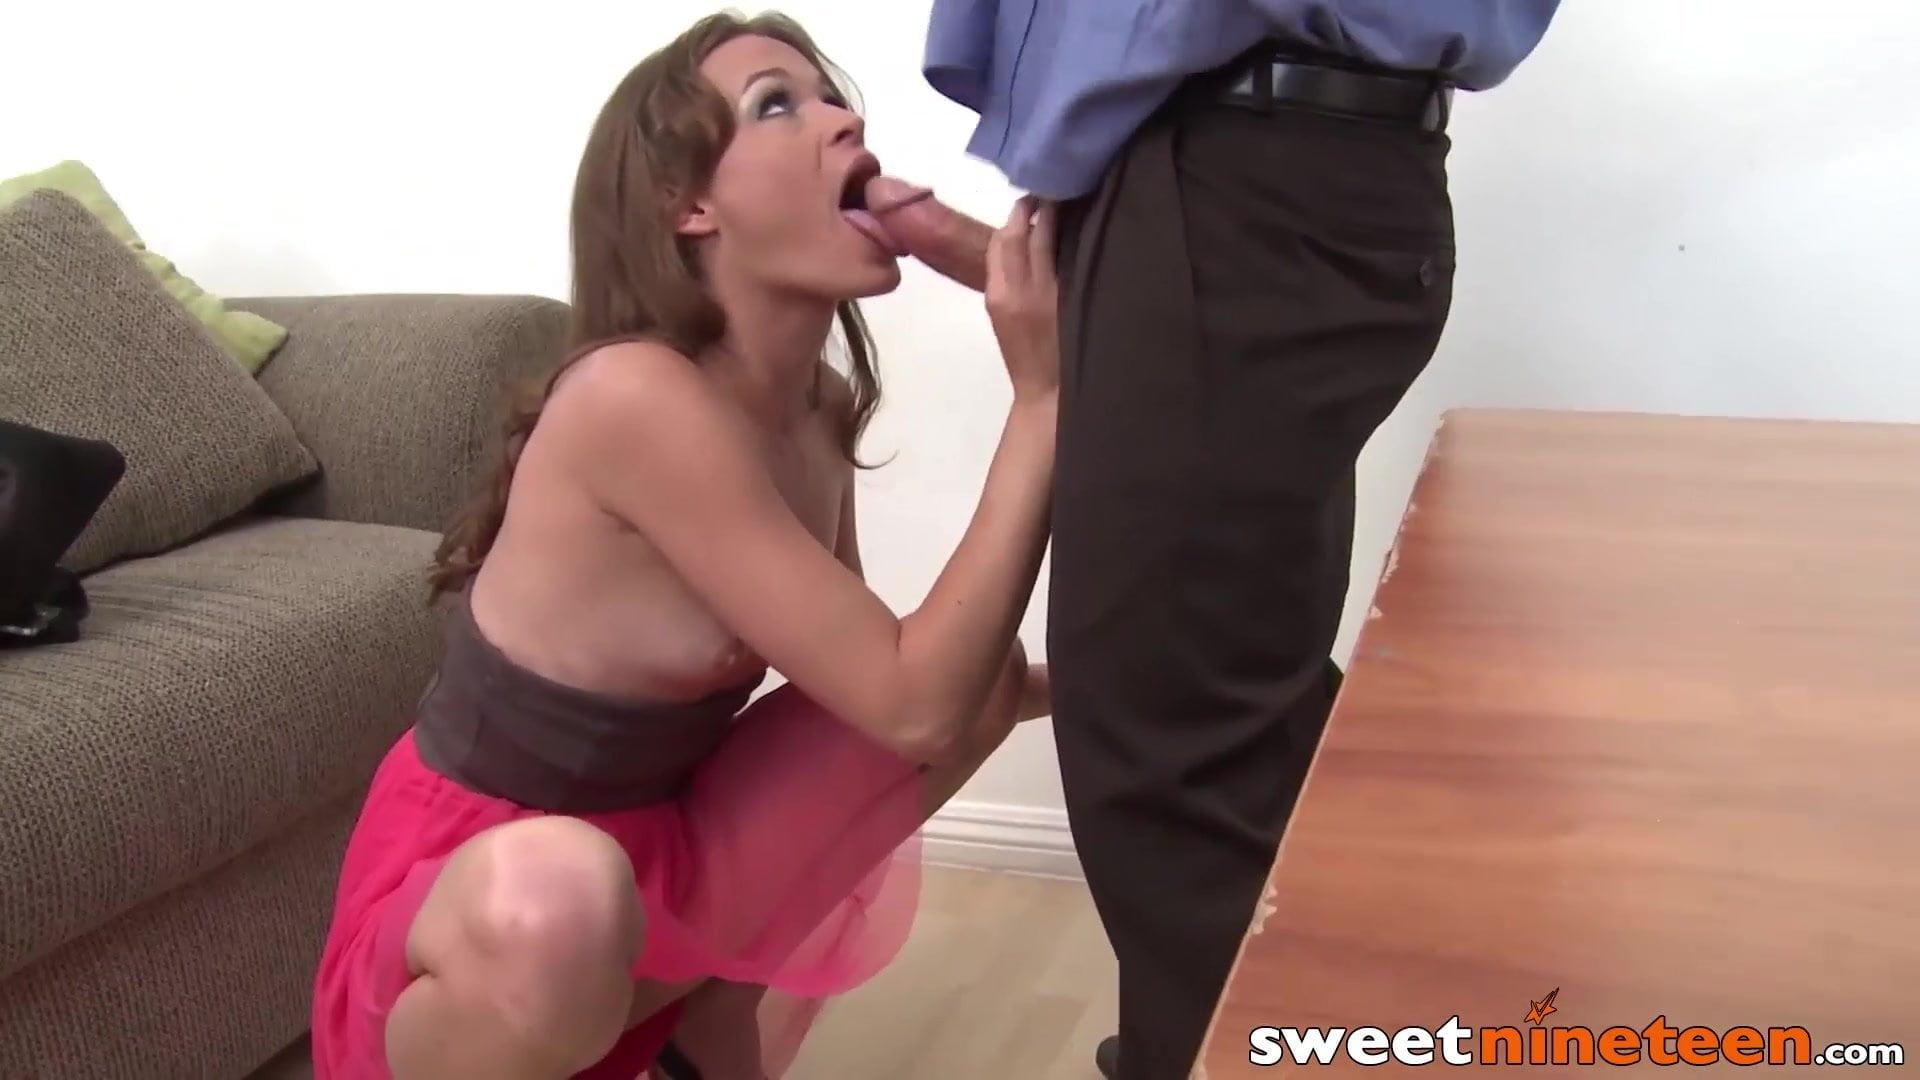 19yo secretary Kacy Lane fucked by boss within the workplace